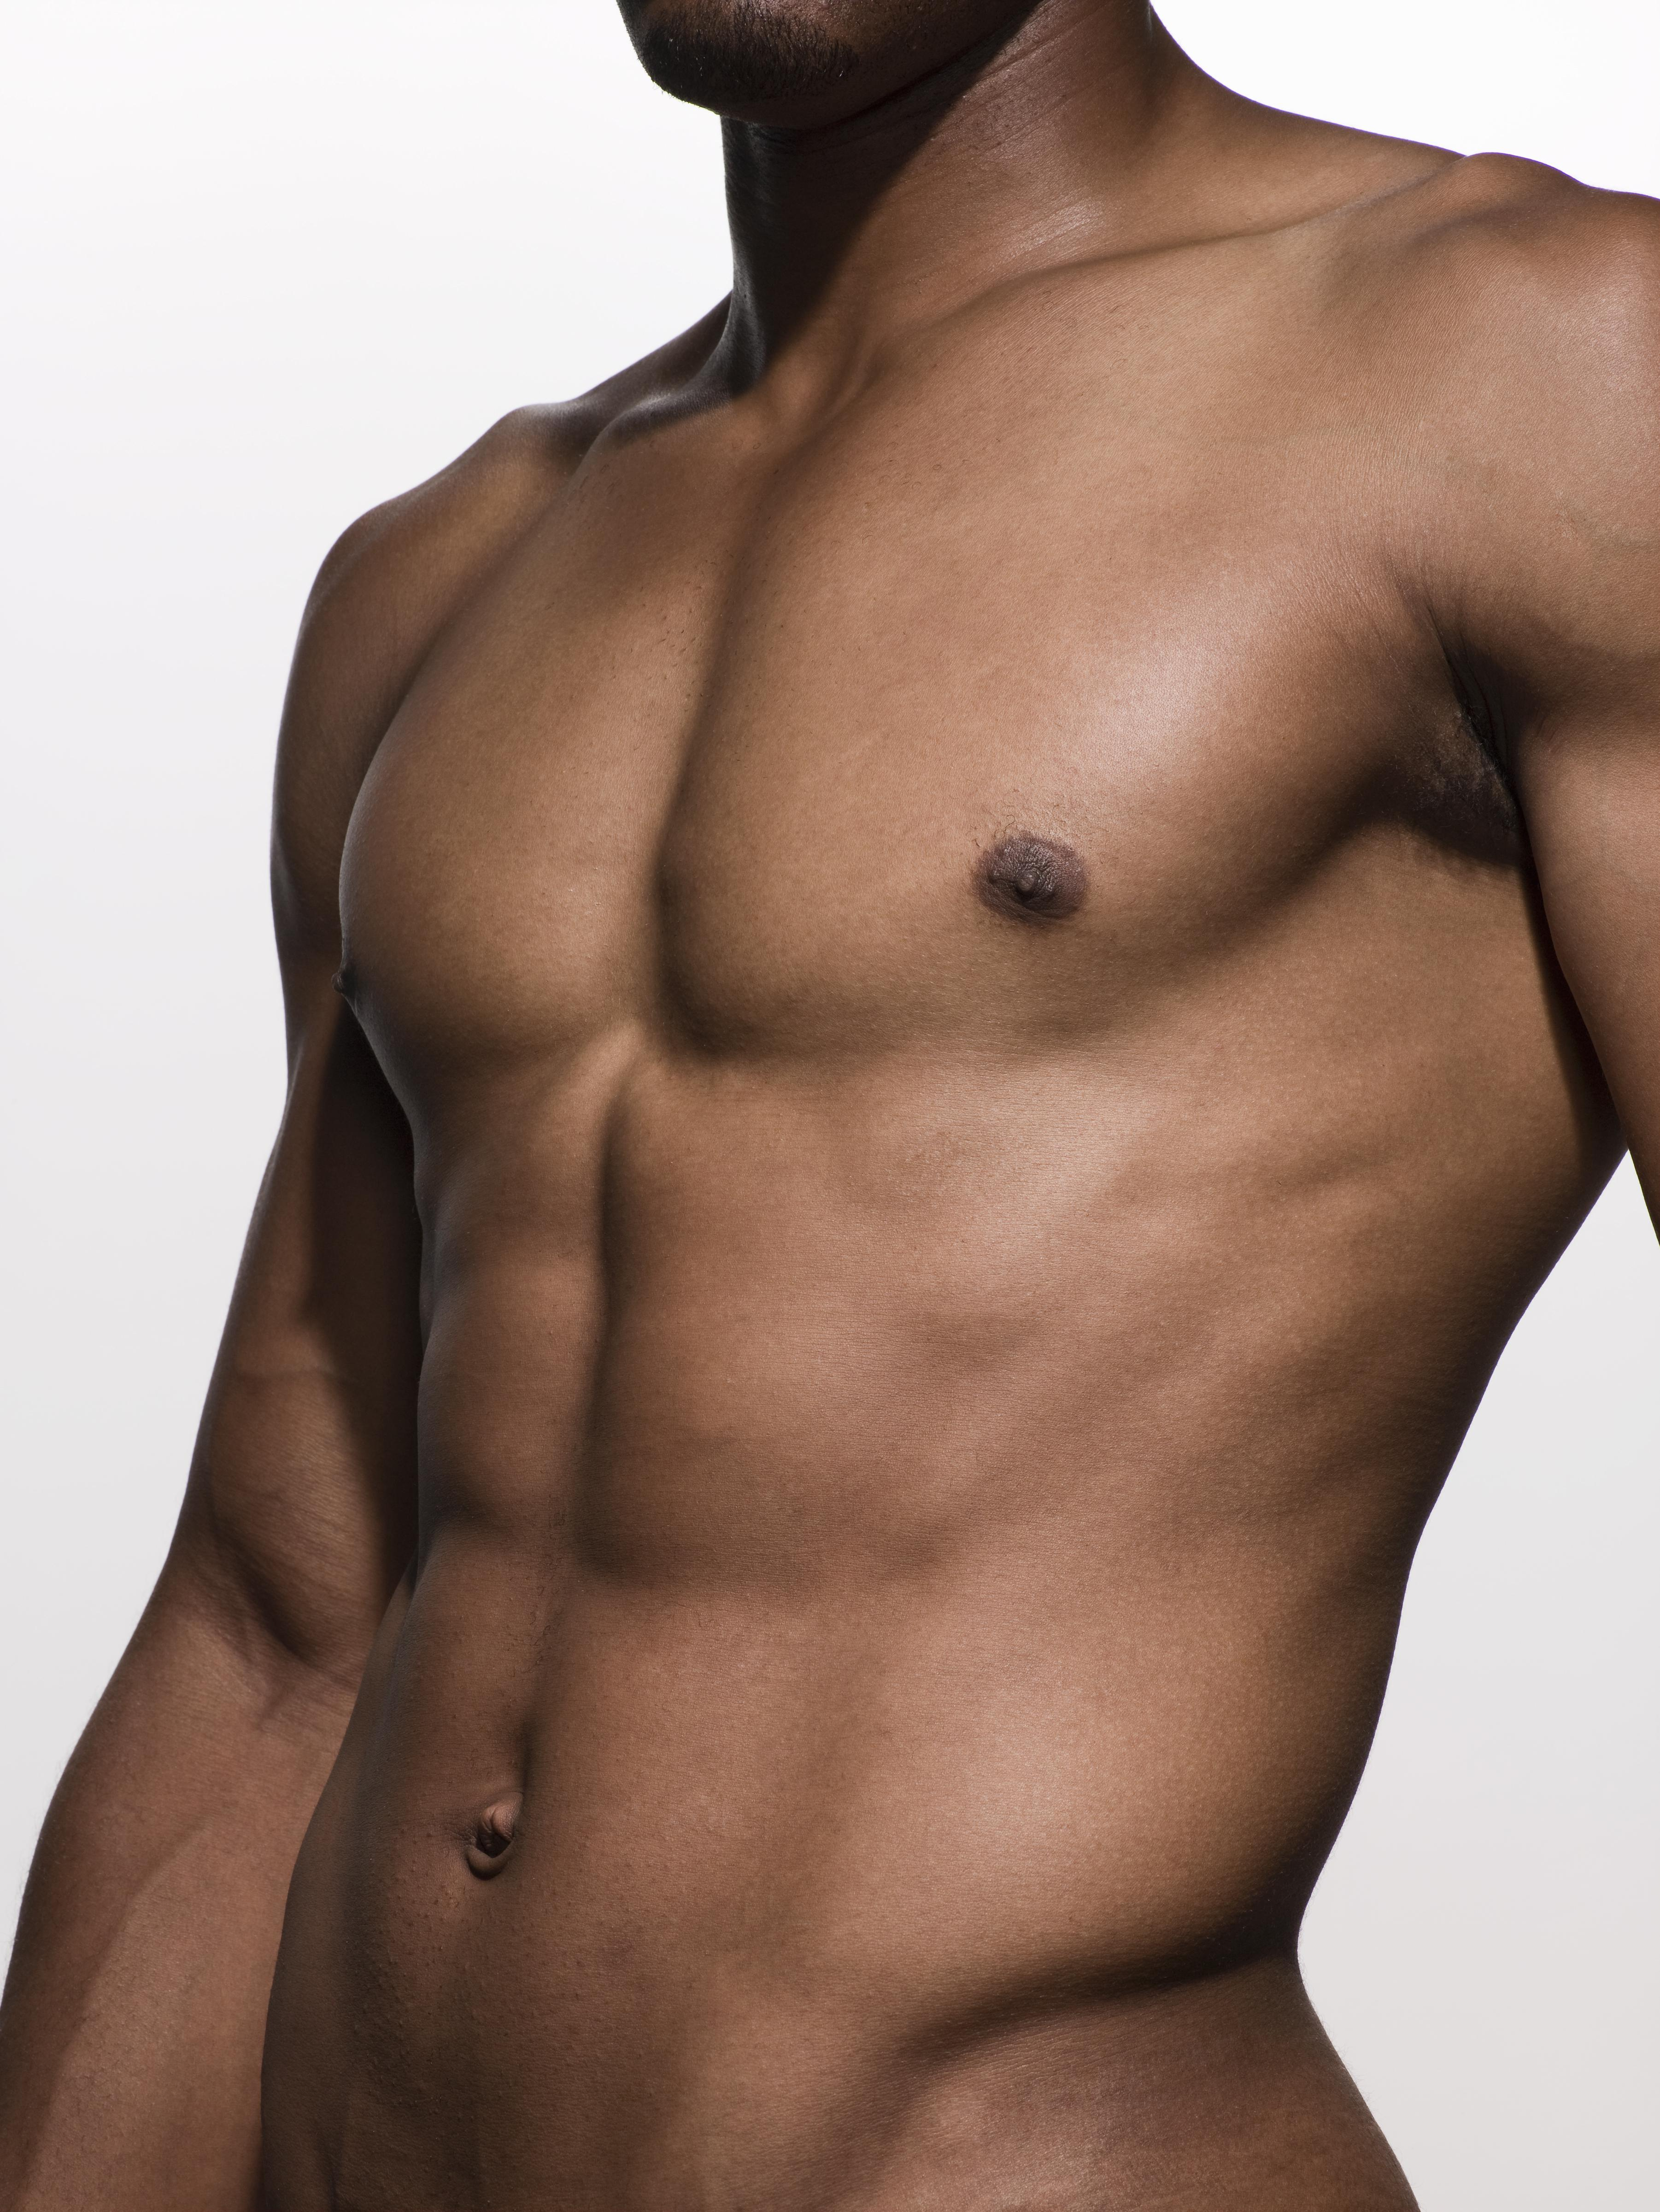 close-up of muscular man's torso